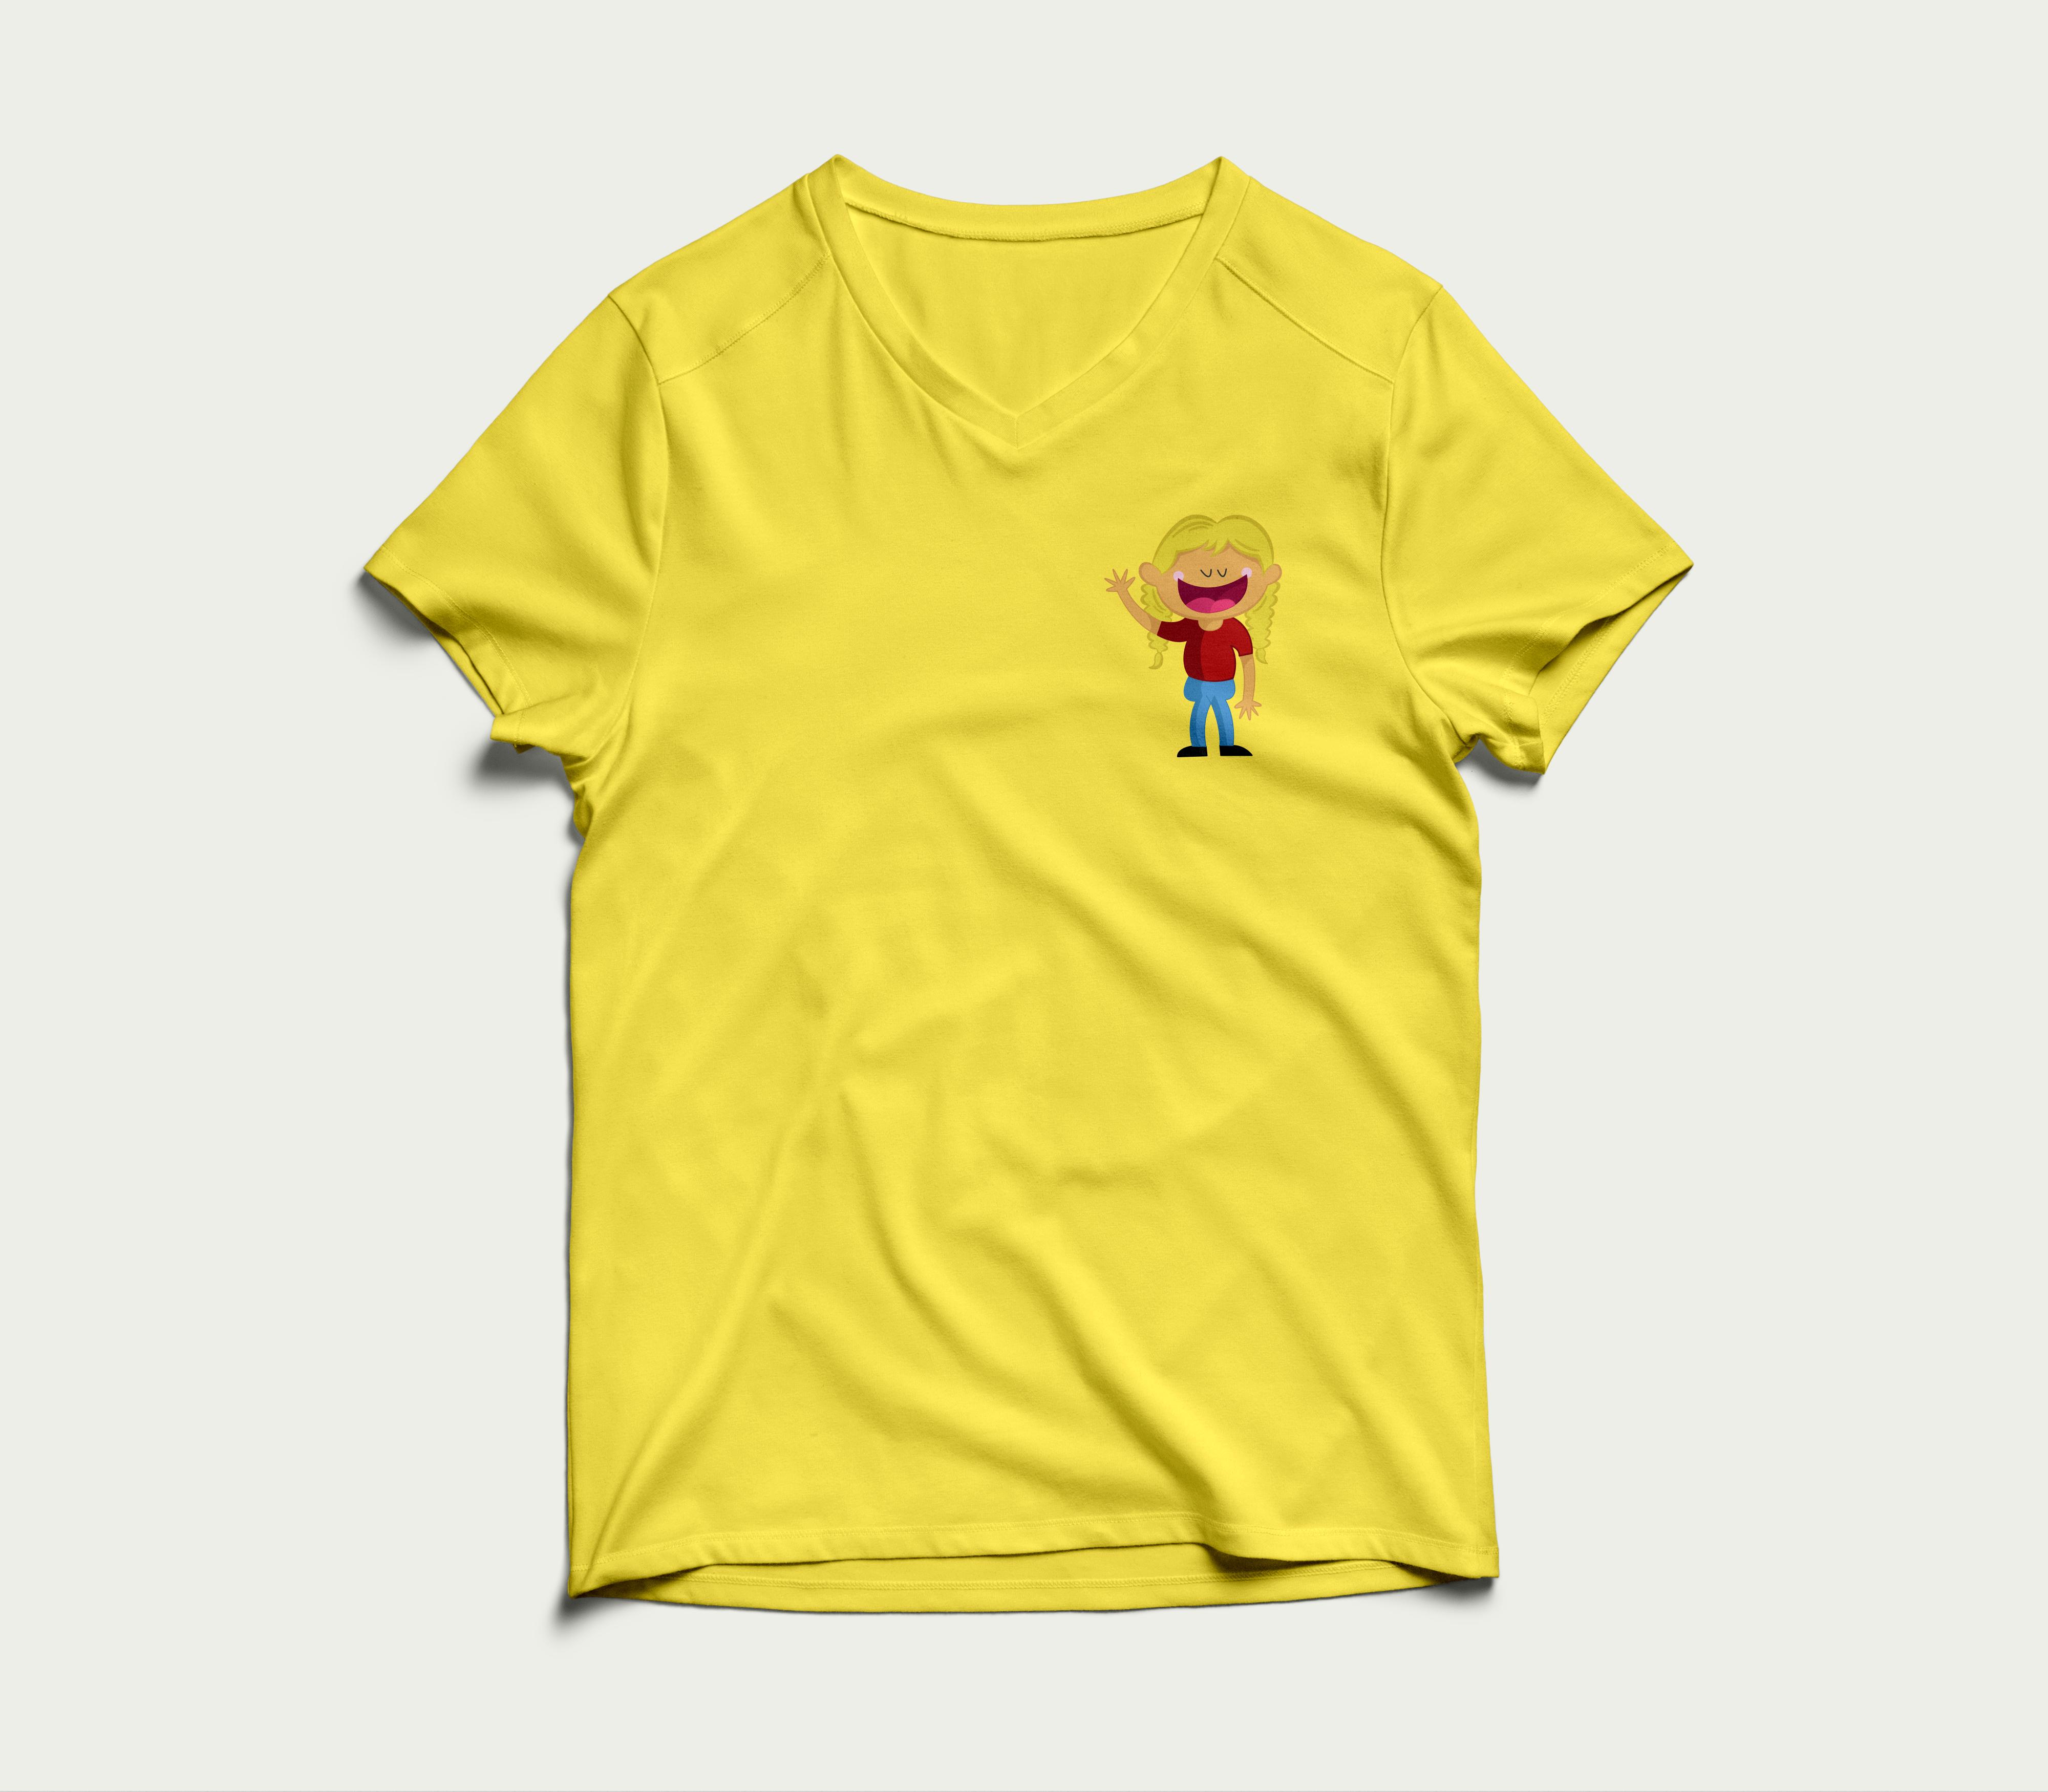 co-founder volunteer shirt